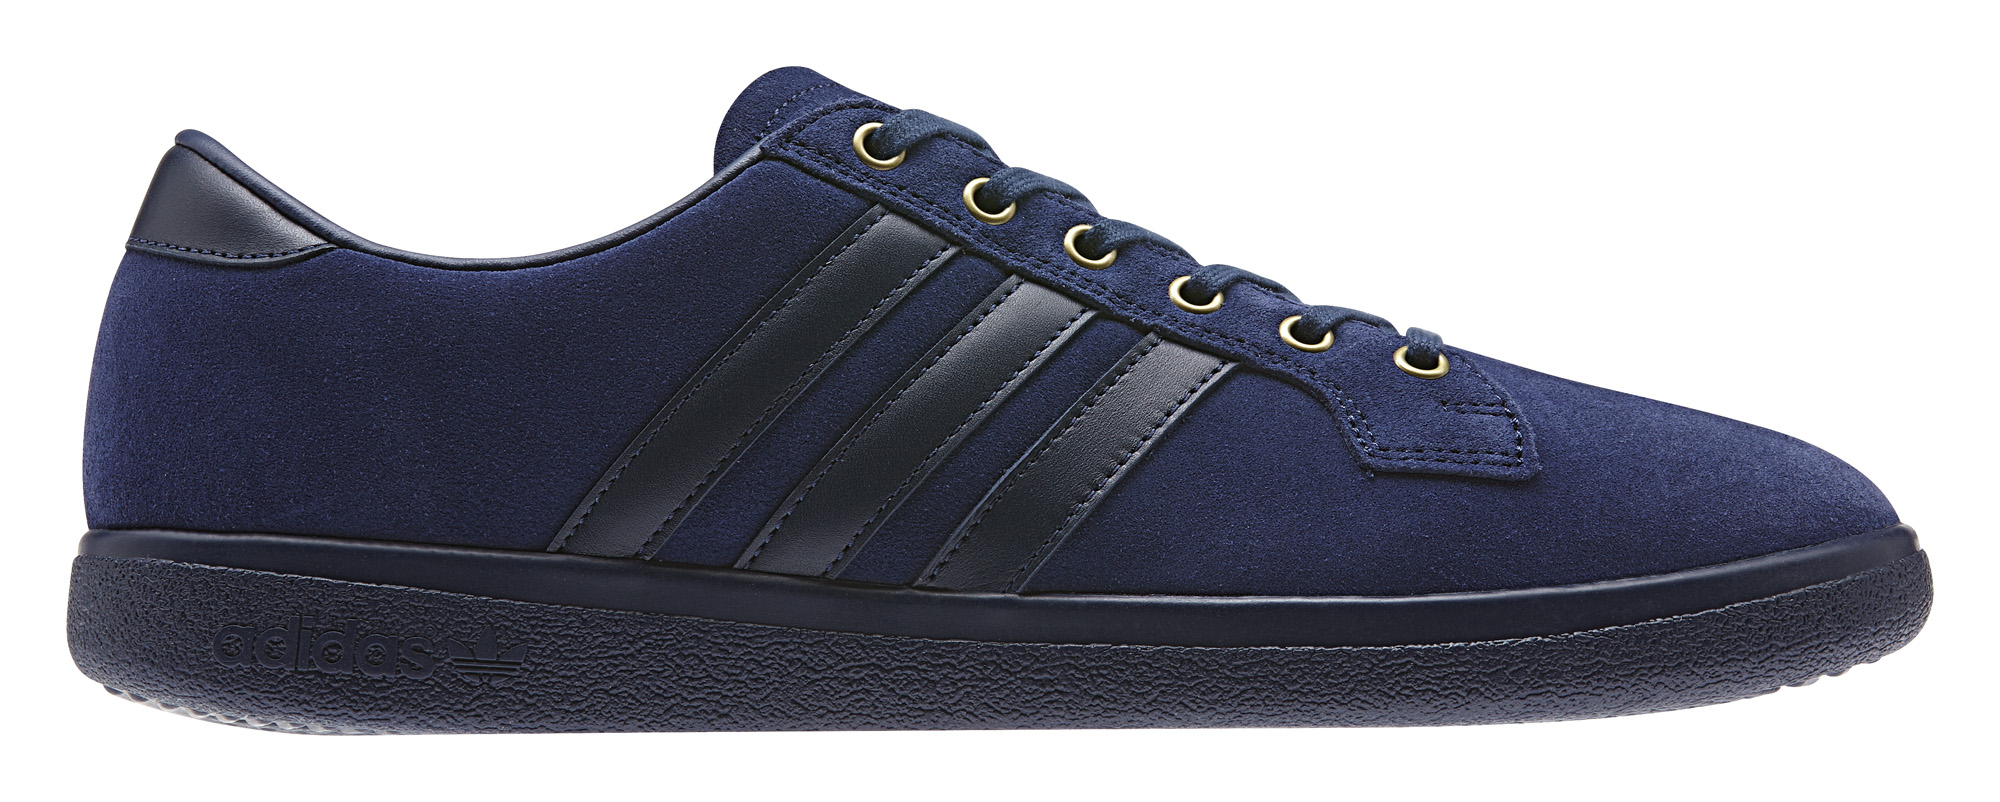 Adidas Spezial Bulhill Navy Profile